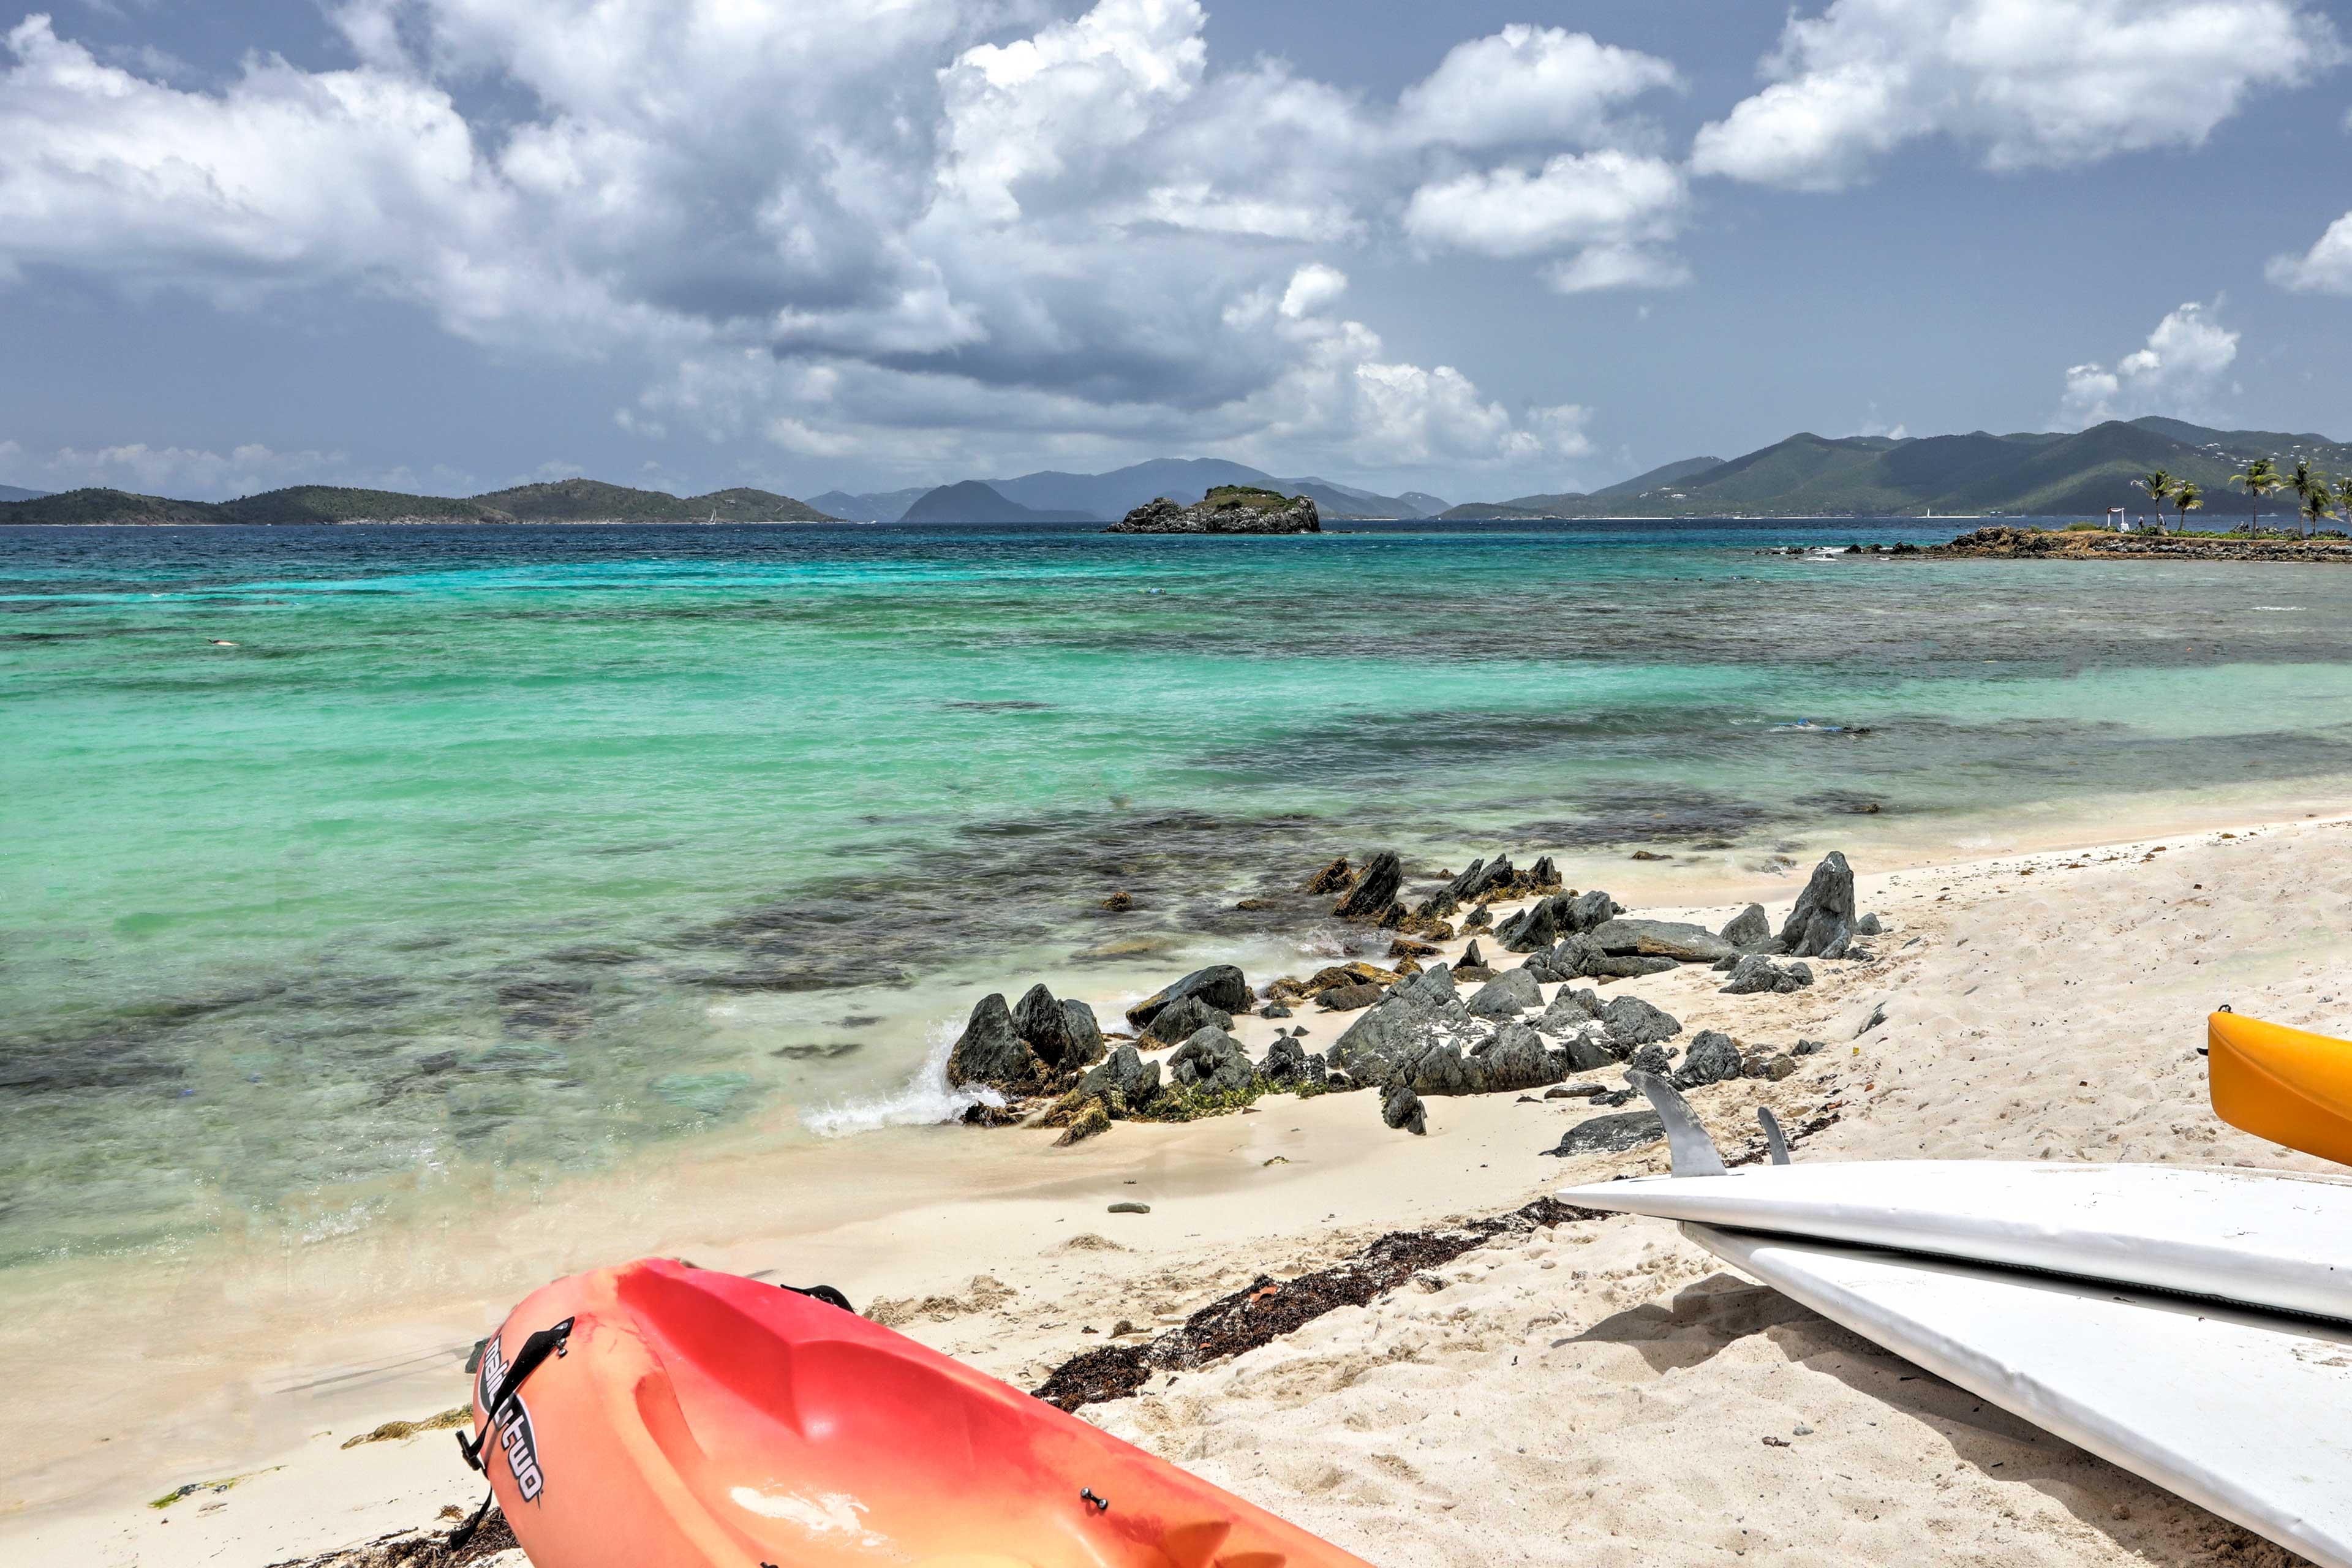 Snorkel, parasail, swim, or kayak for incredible St. Thomas memories!